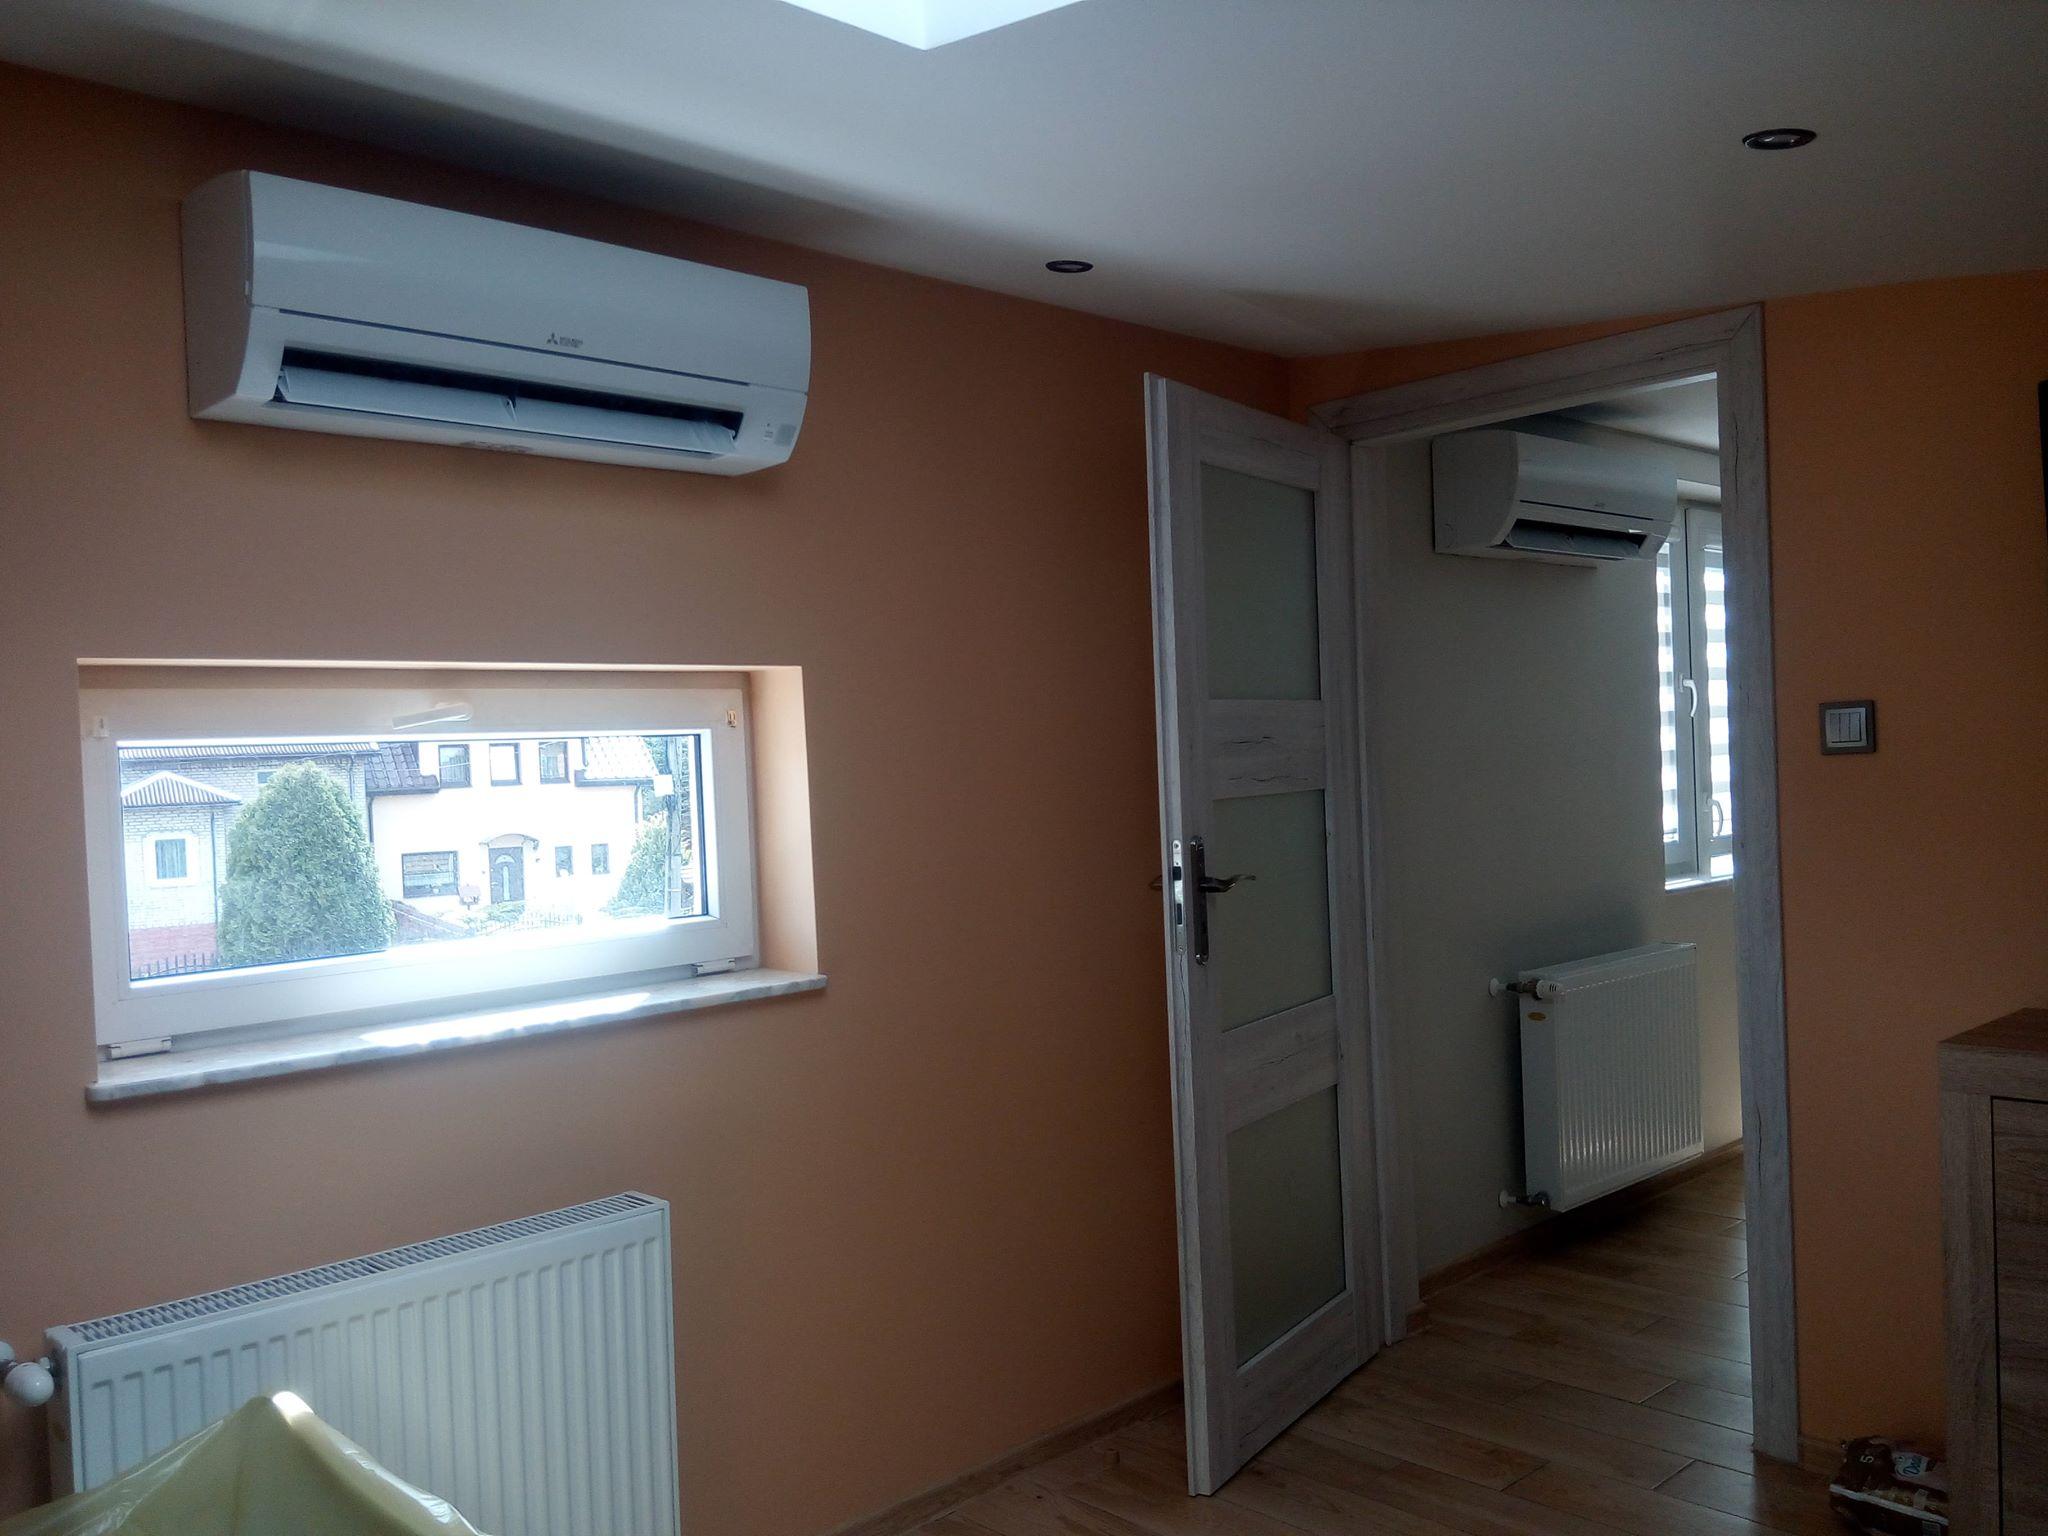 klimatyzatory do sypialni Mitsubishi Starachowice